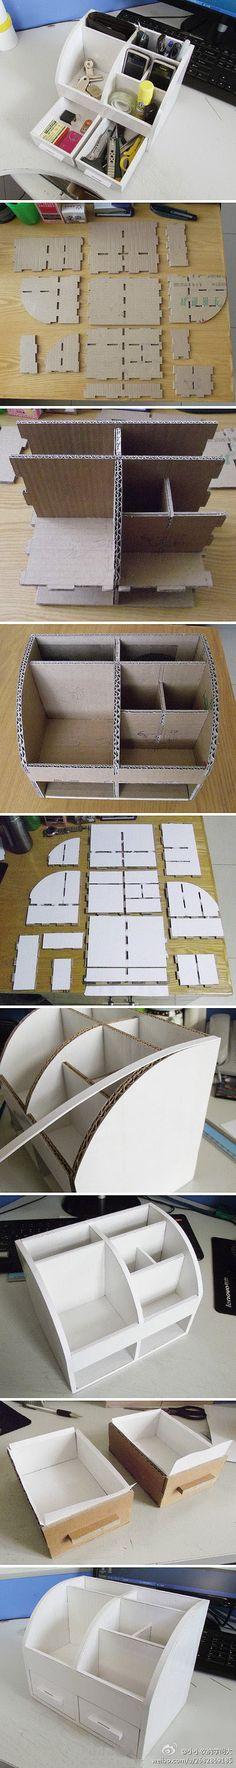 Cardboard storage with dividers